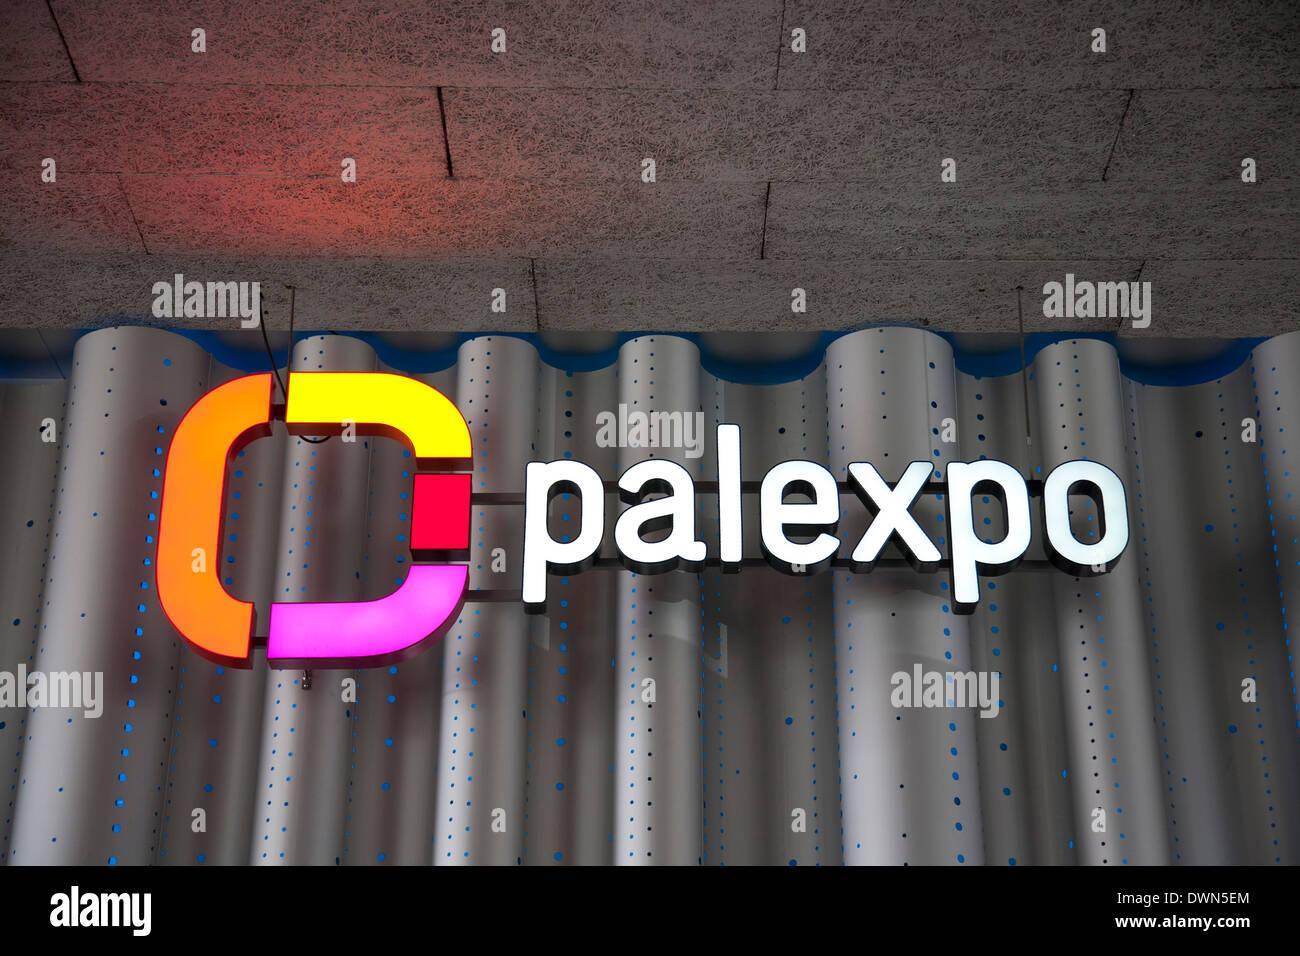 Palexpo exhibition hall signage at the 84th Geneva International Motor Show 2014. - Stock Image